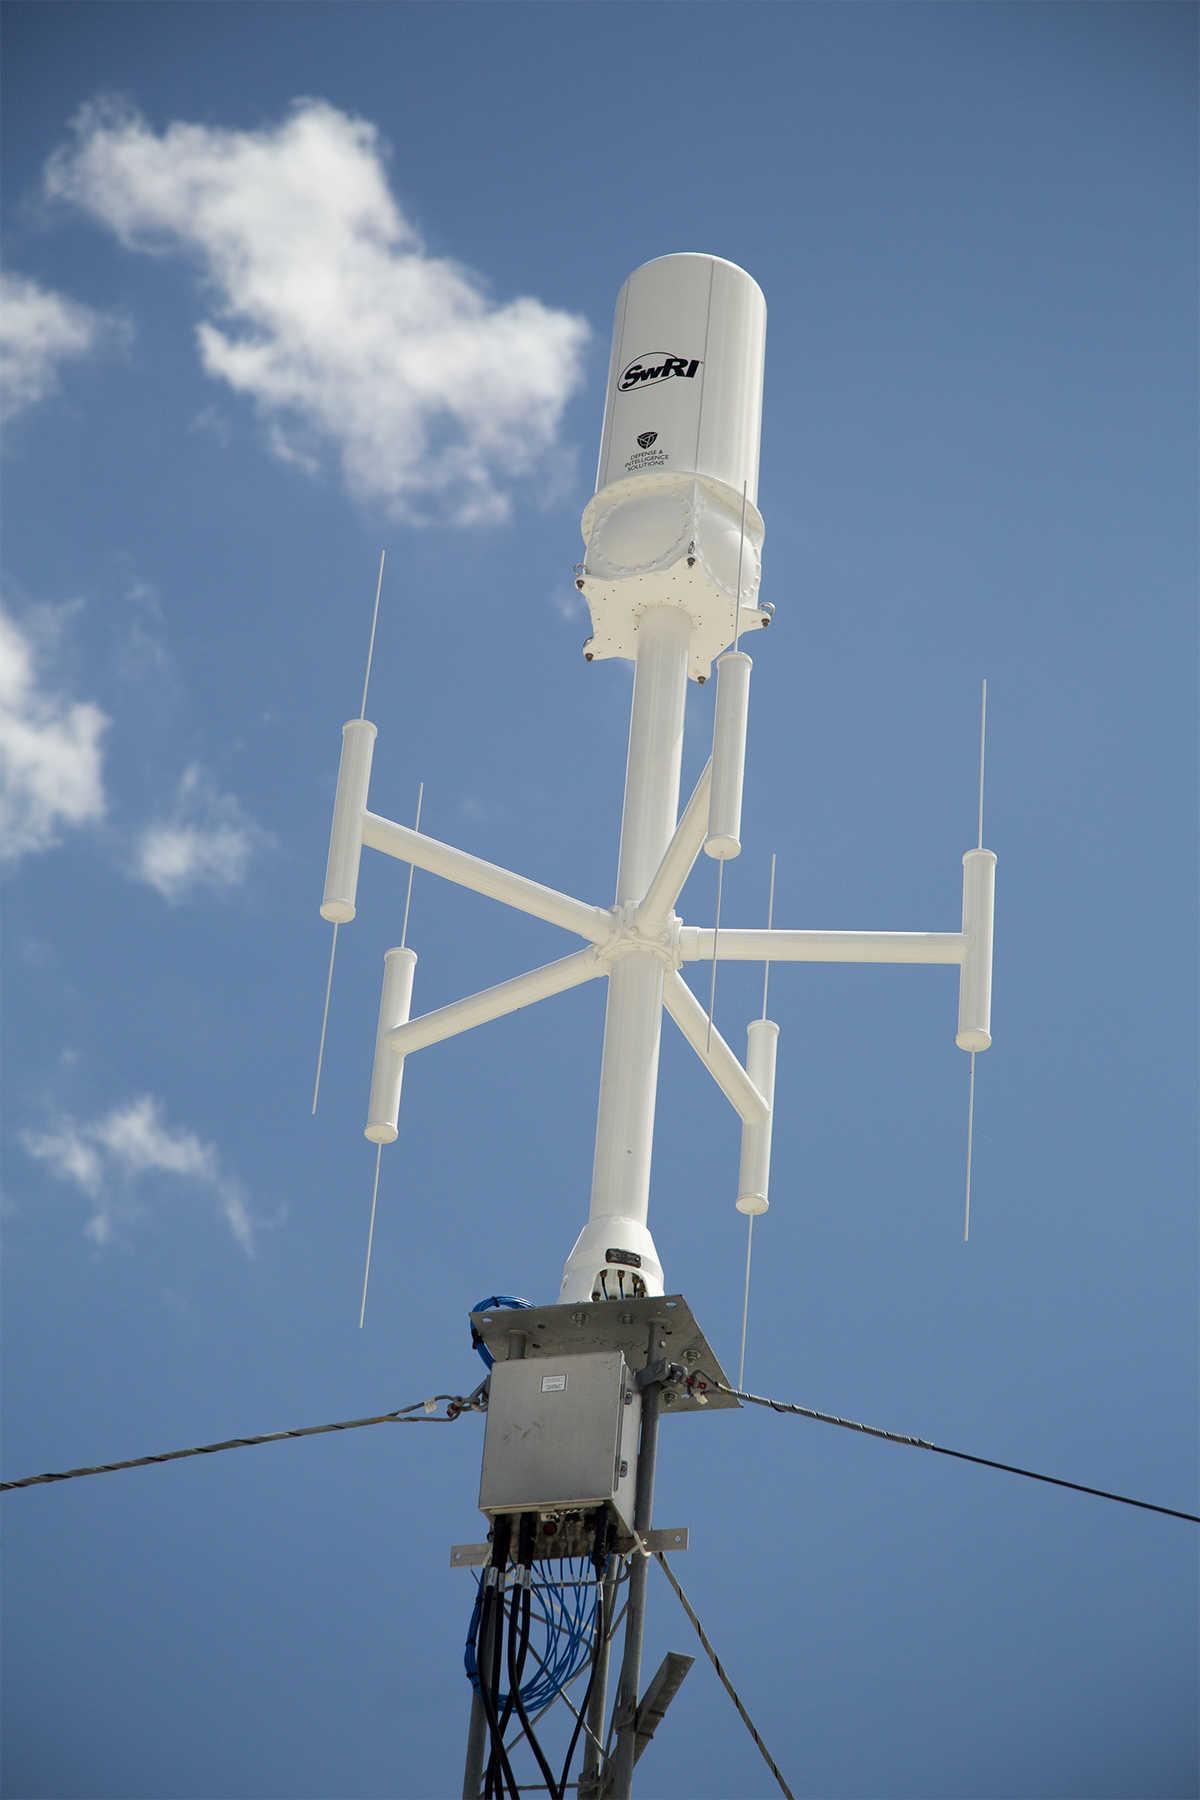 The AF-369 VHF/UHF DF Antenna